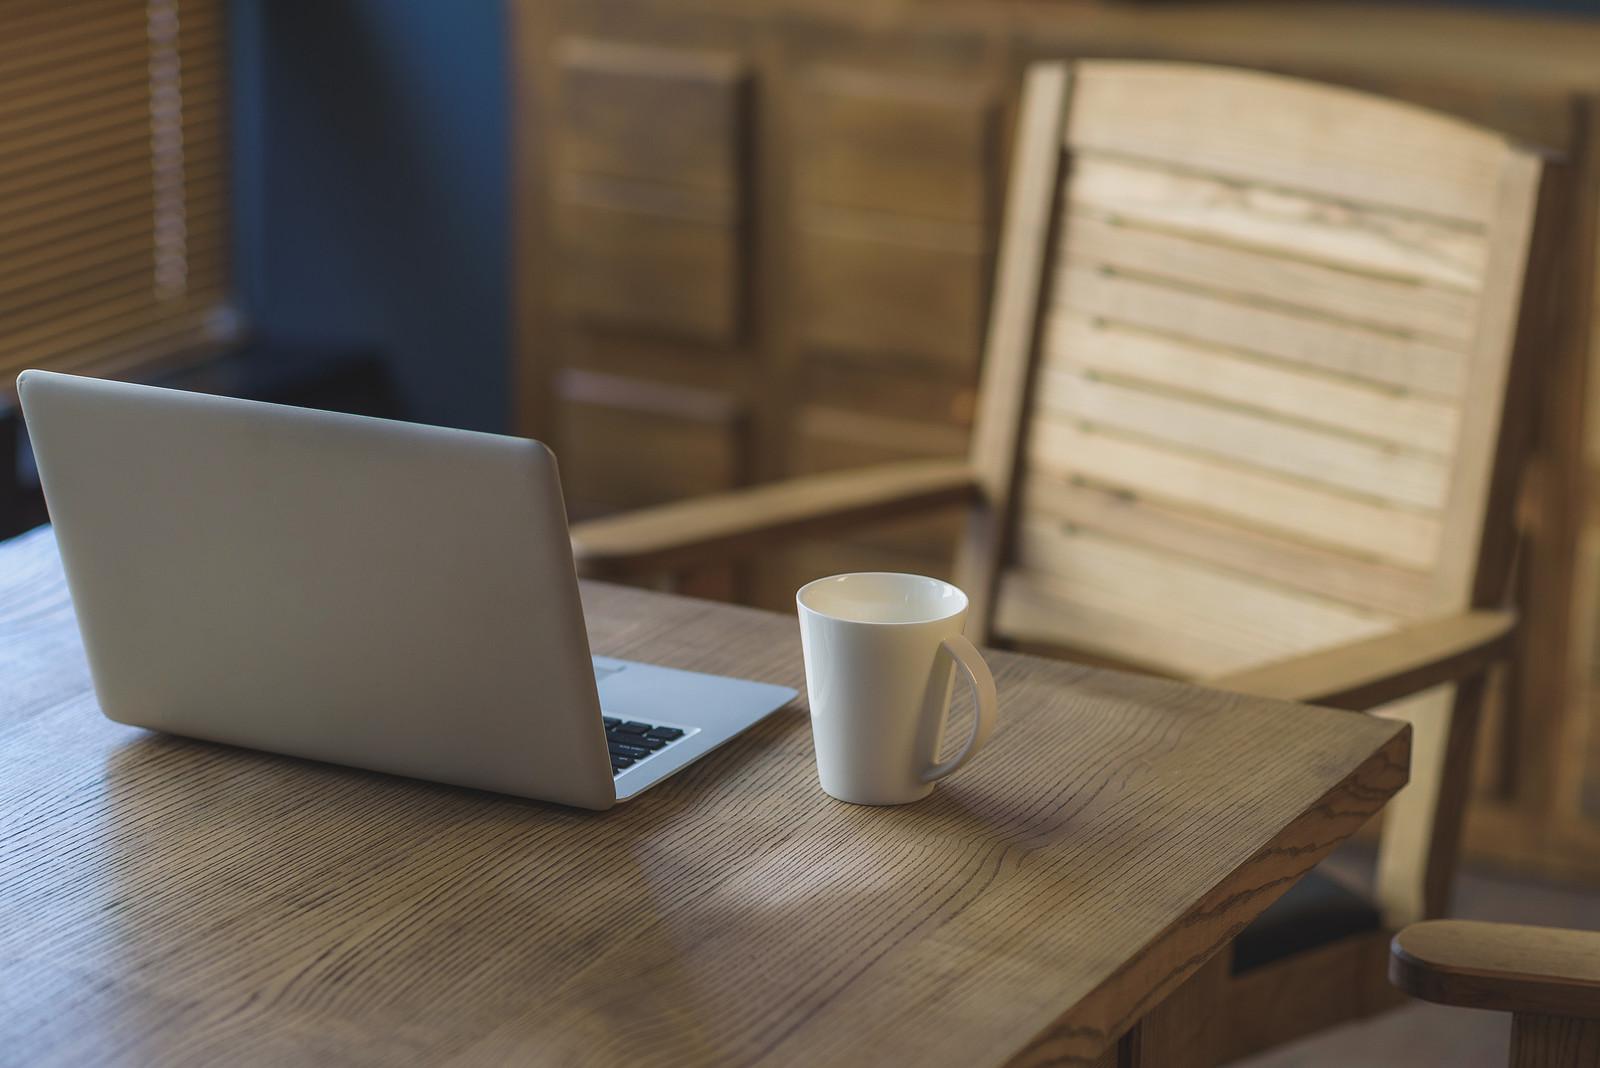 Laptop and mug of tea on a table.